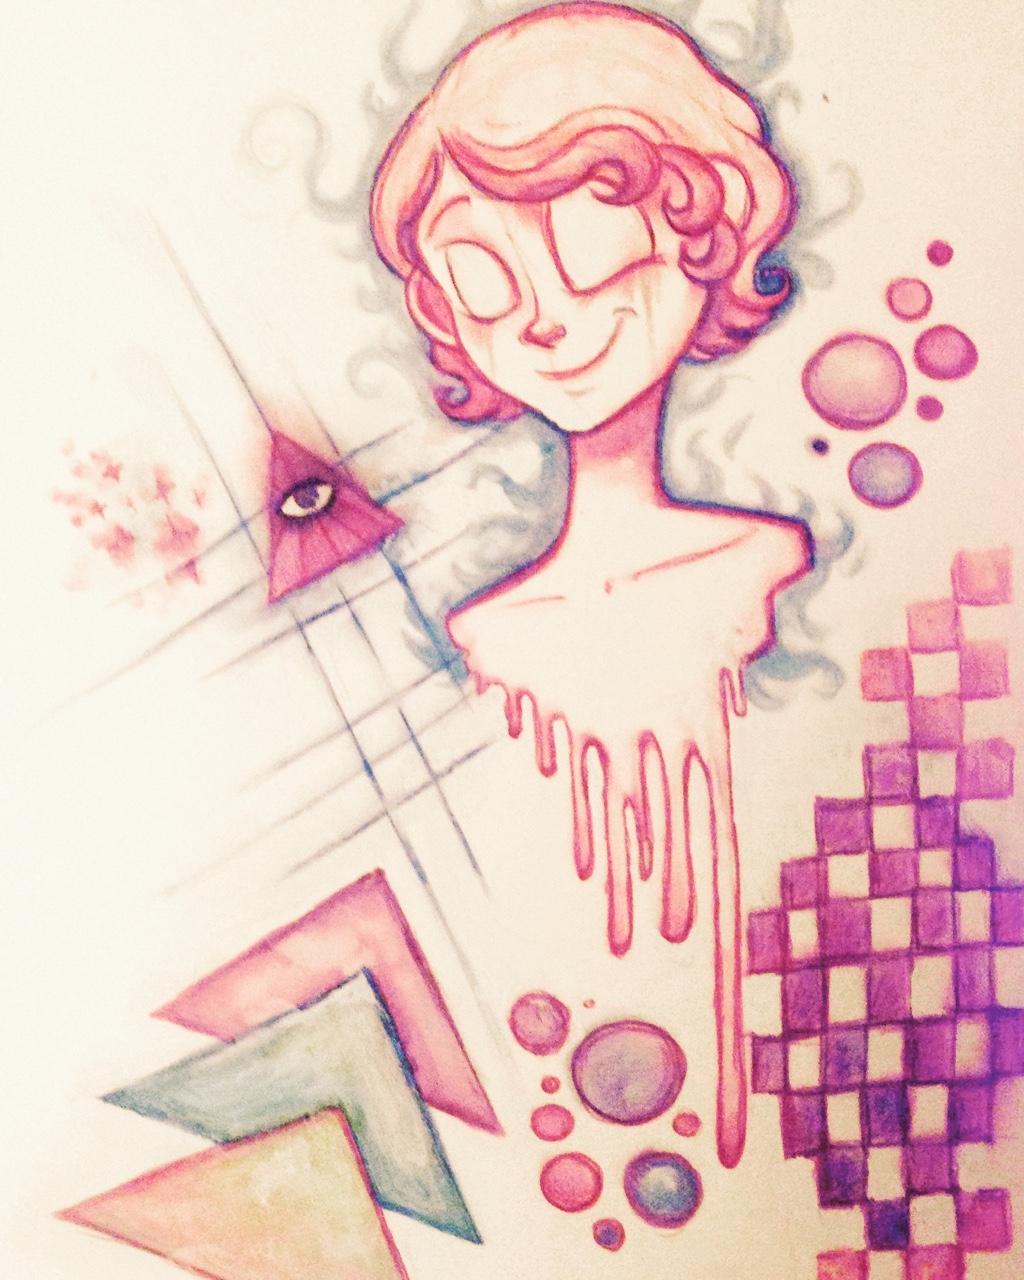 Download Art Vaporwave Drawing JPG